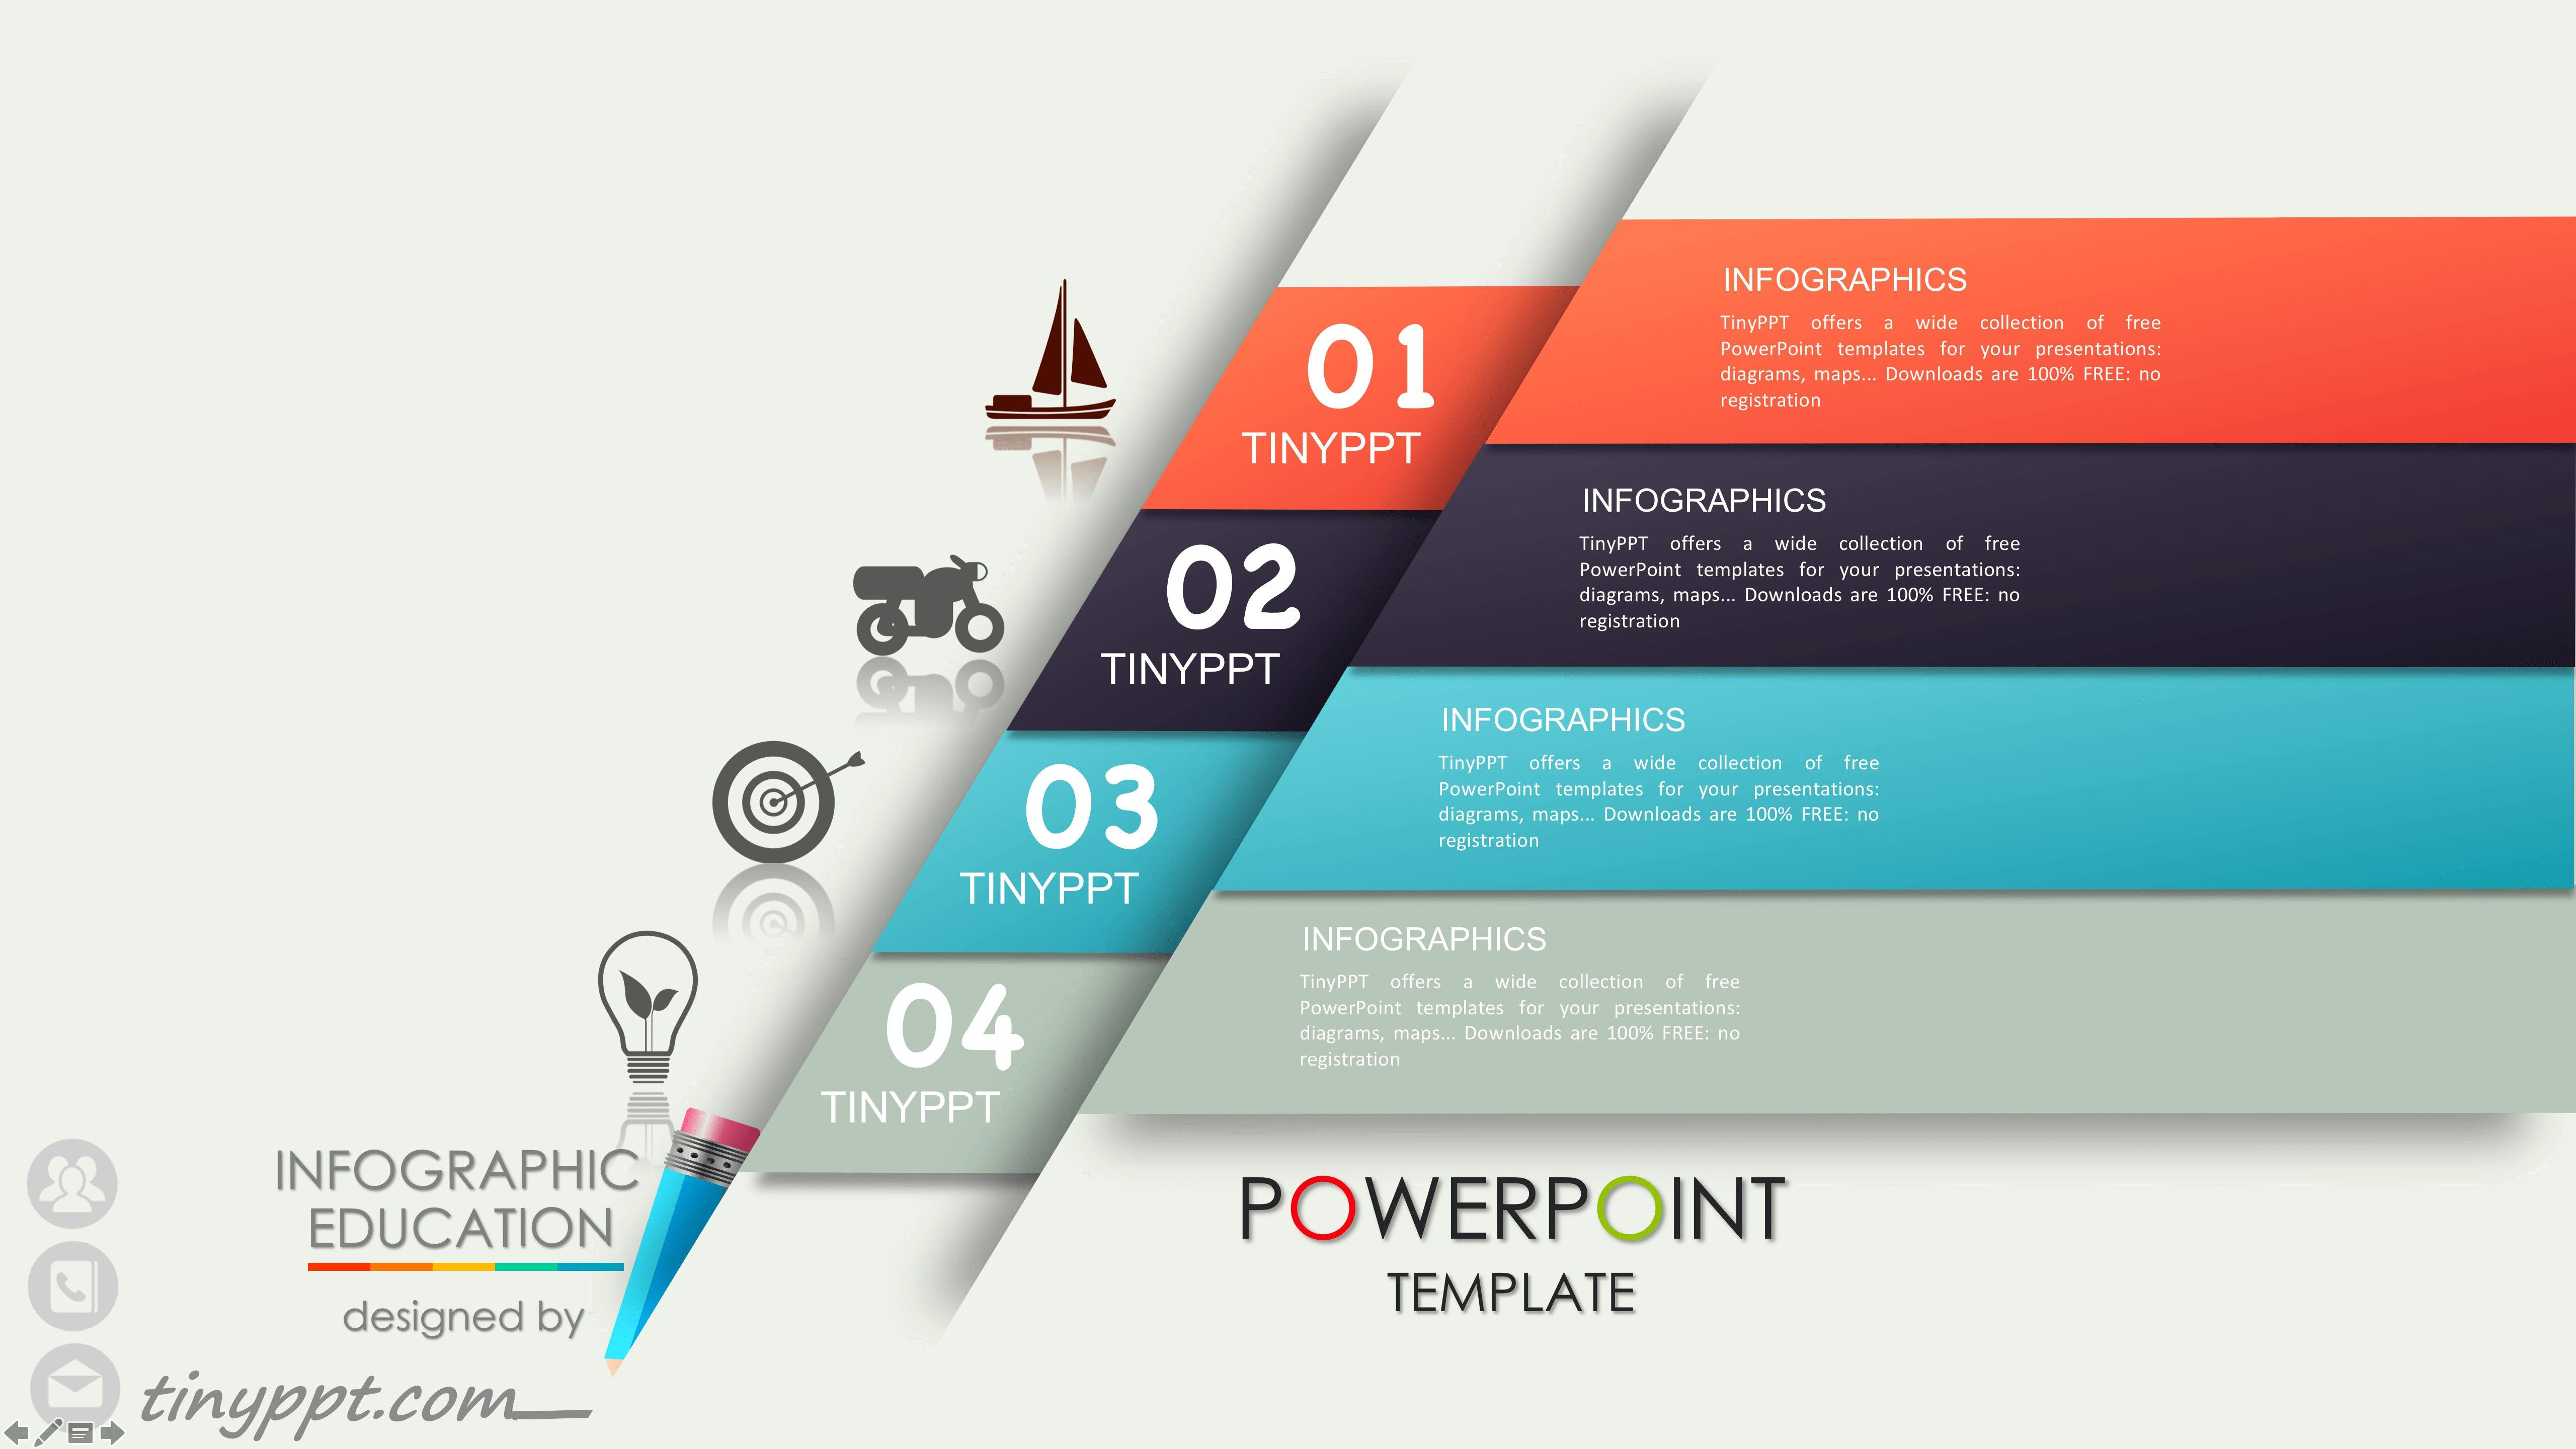 014businessproposalpowerpointtemplatefreedownload